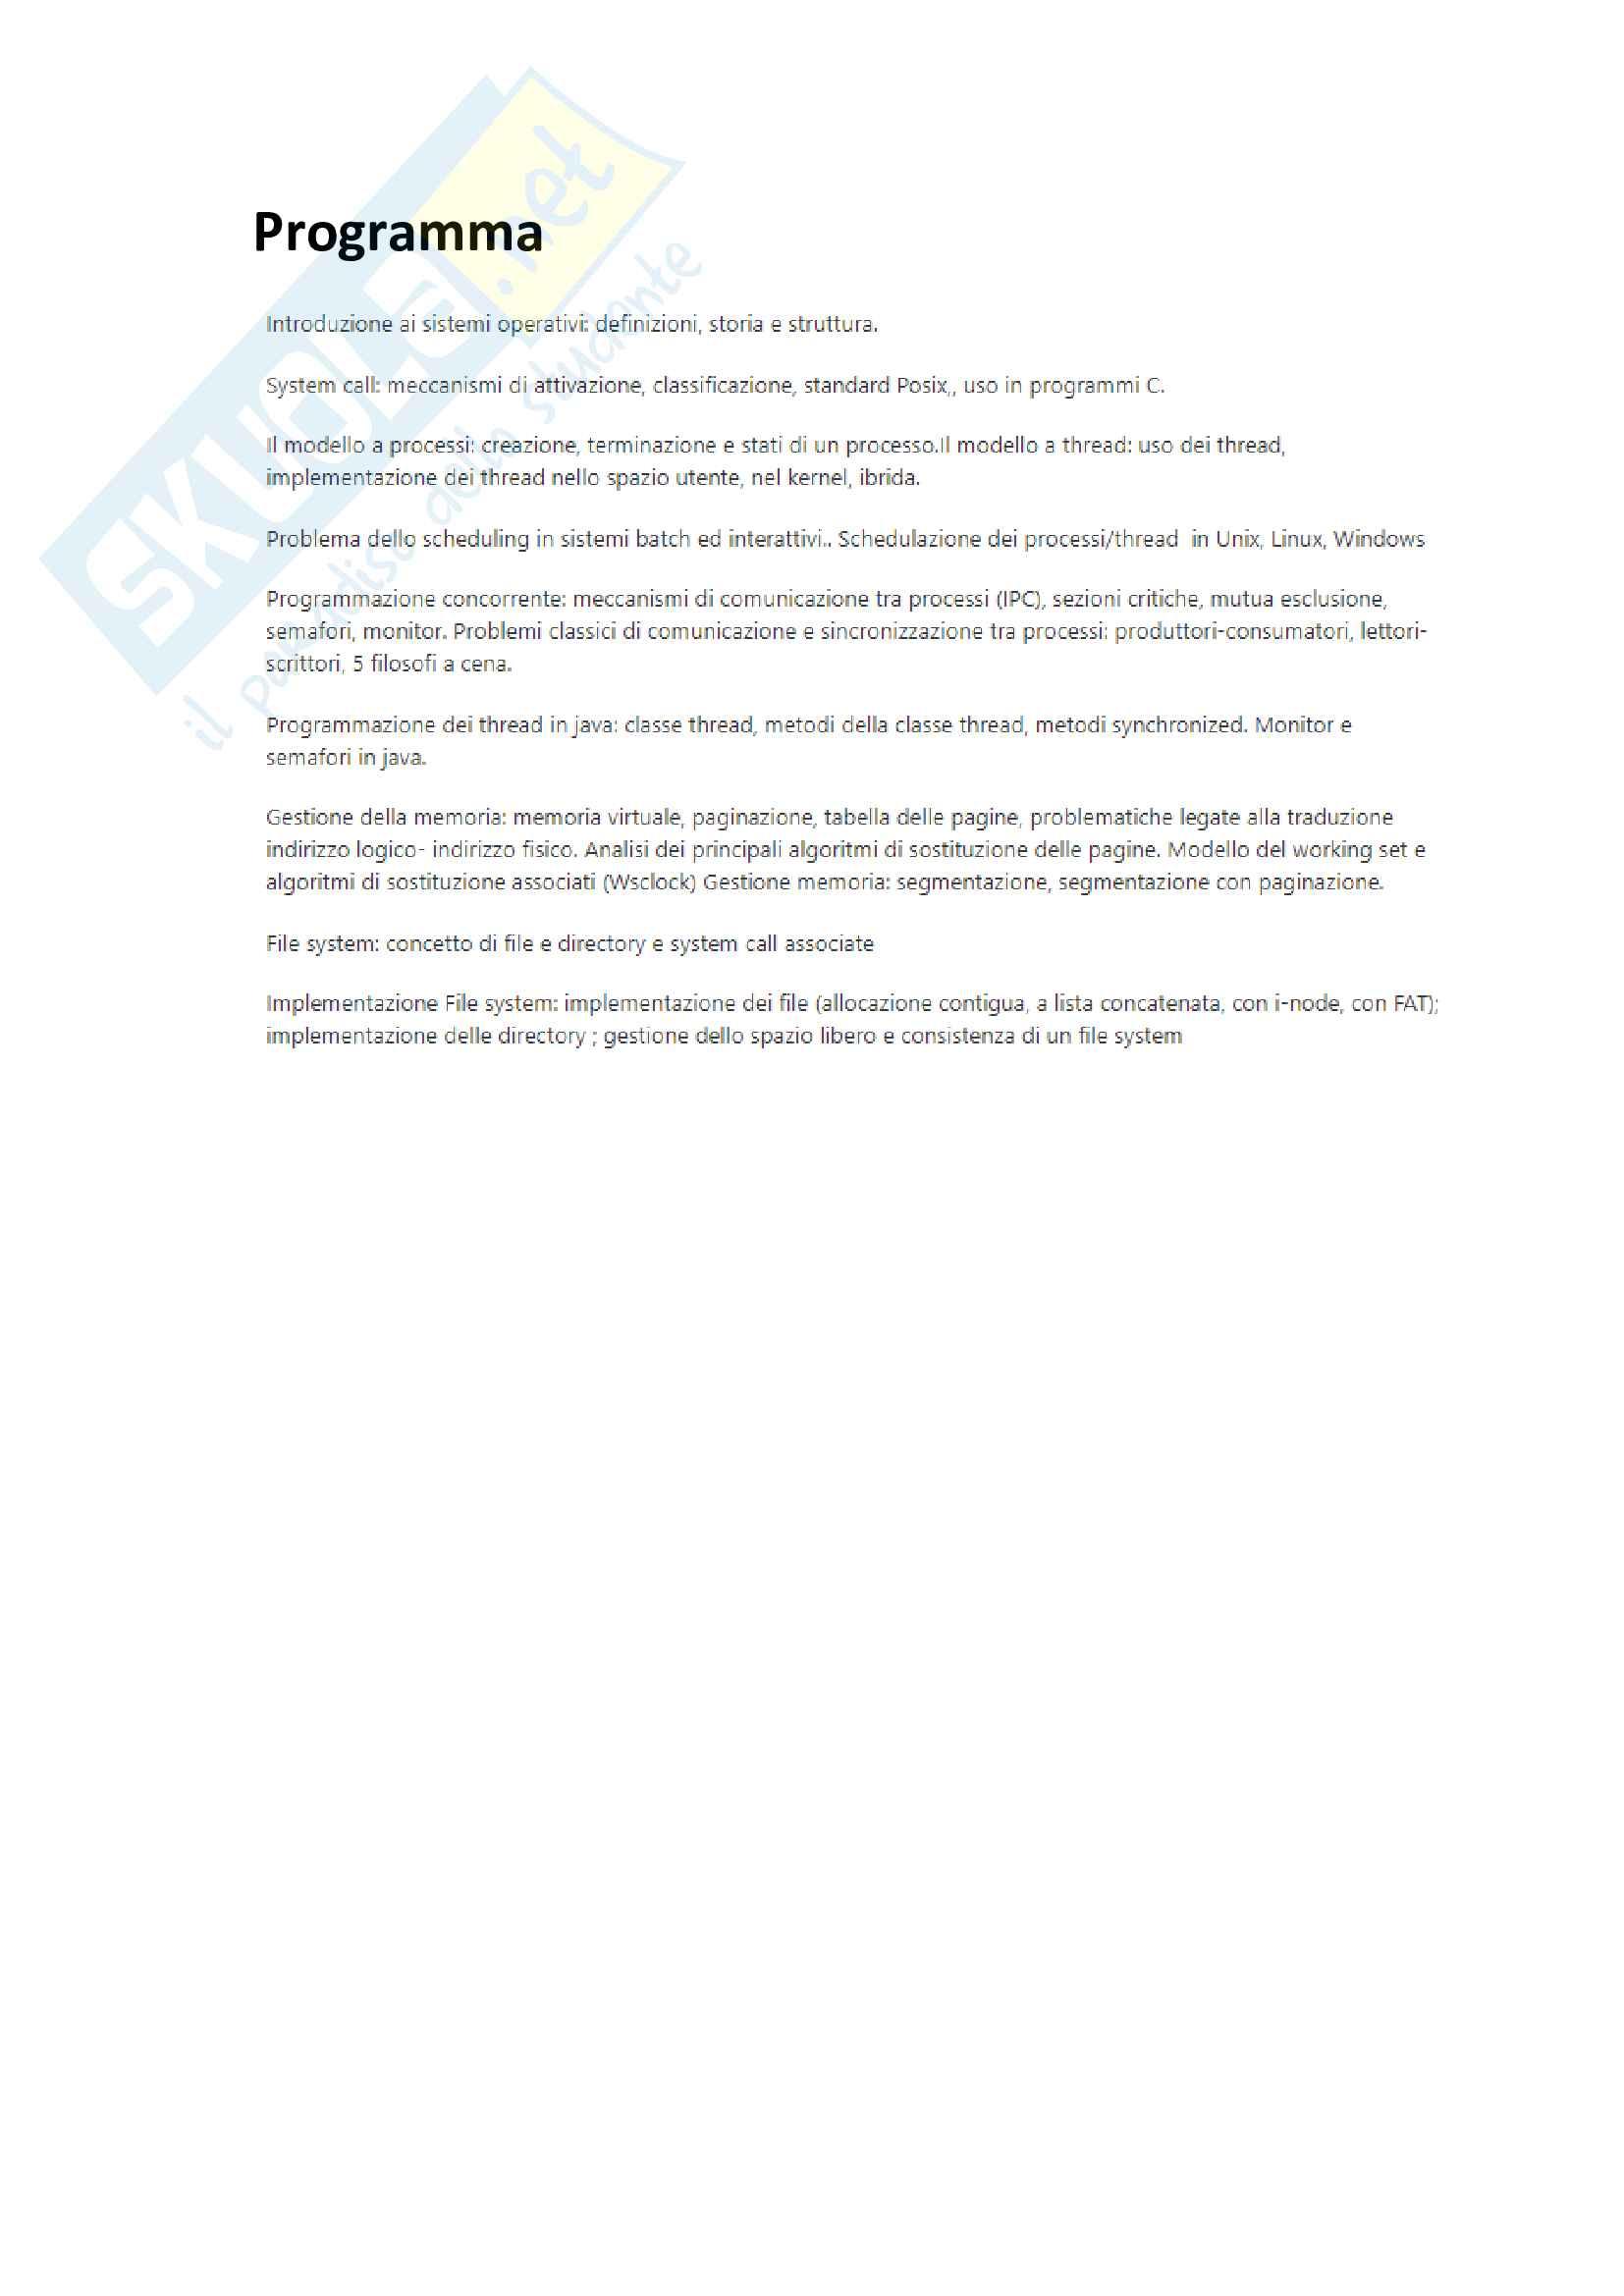 Sistemi operativi - teoria completa